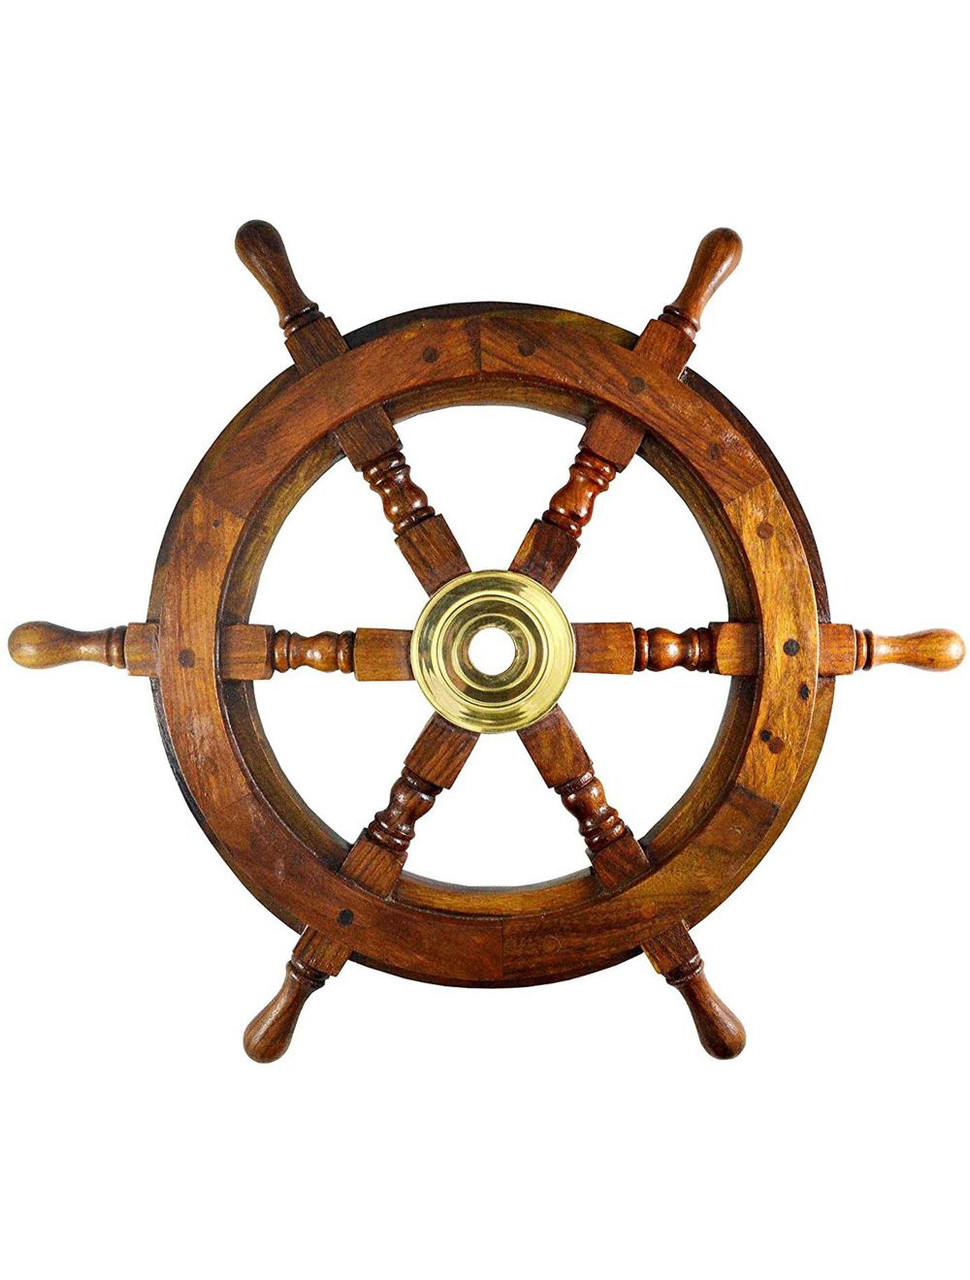 Nautical Teak Wood Ships Wheel Solid Pirate Wall Decor